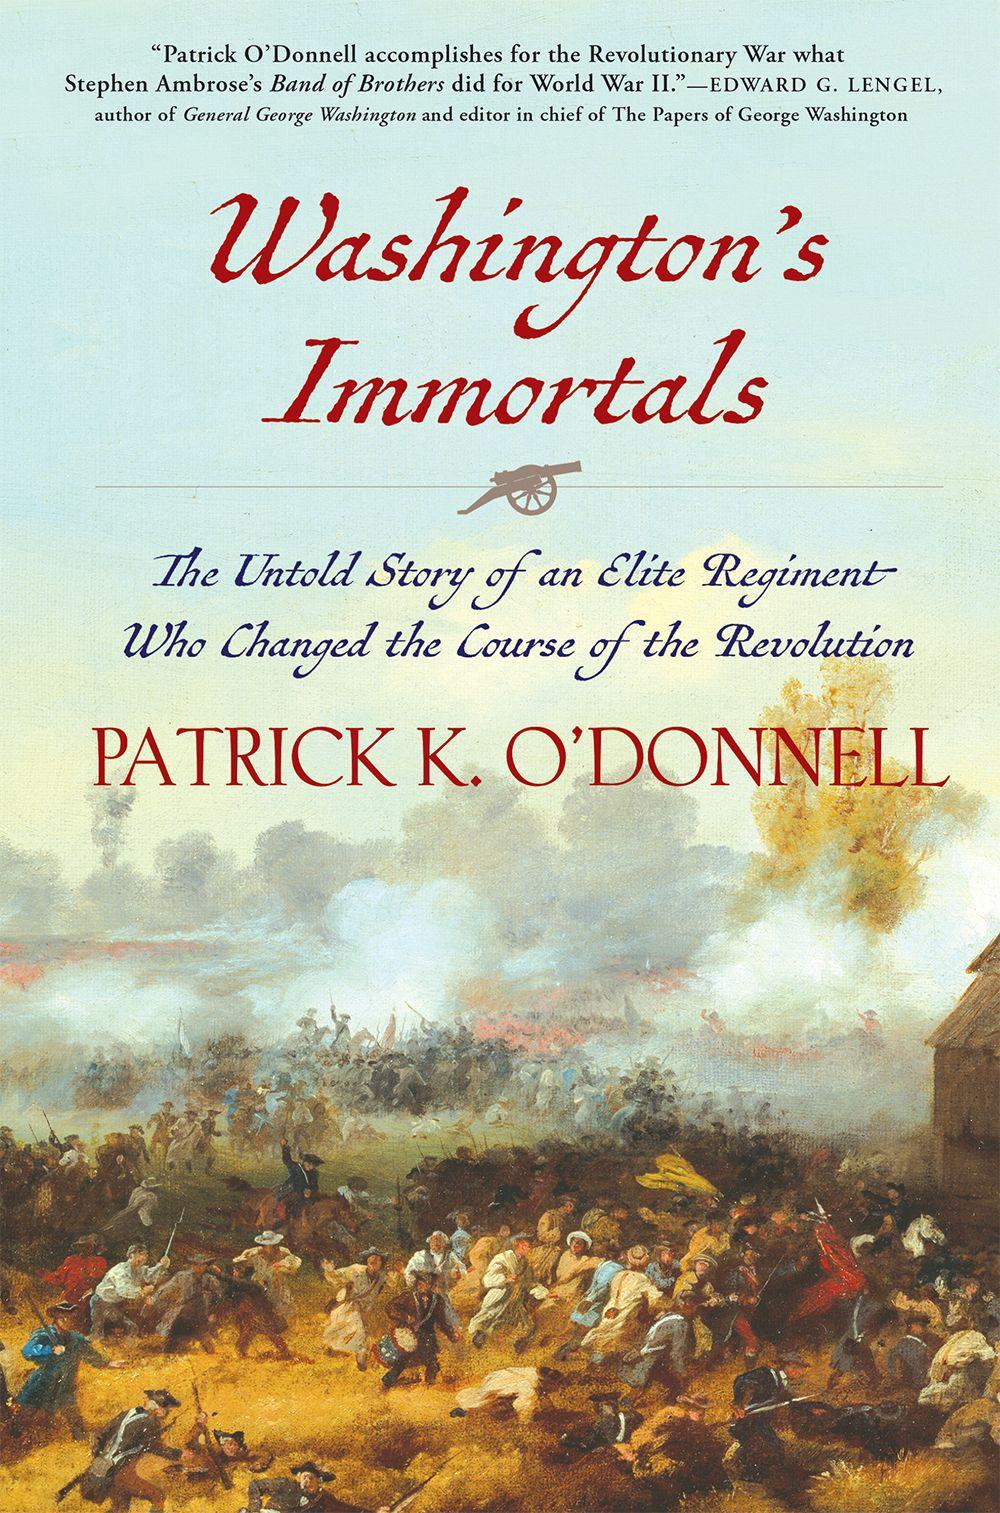 'Washington's Immortals'